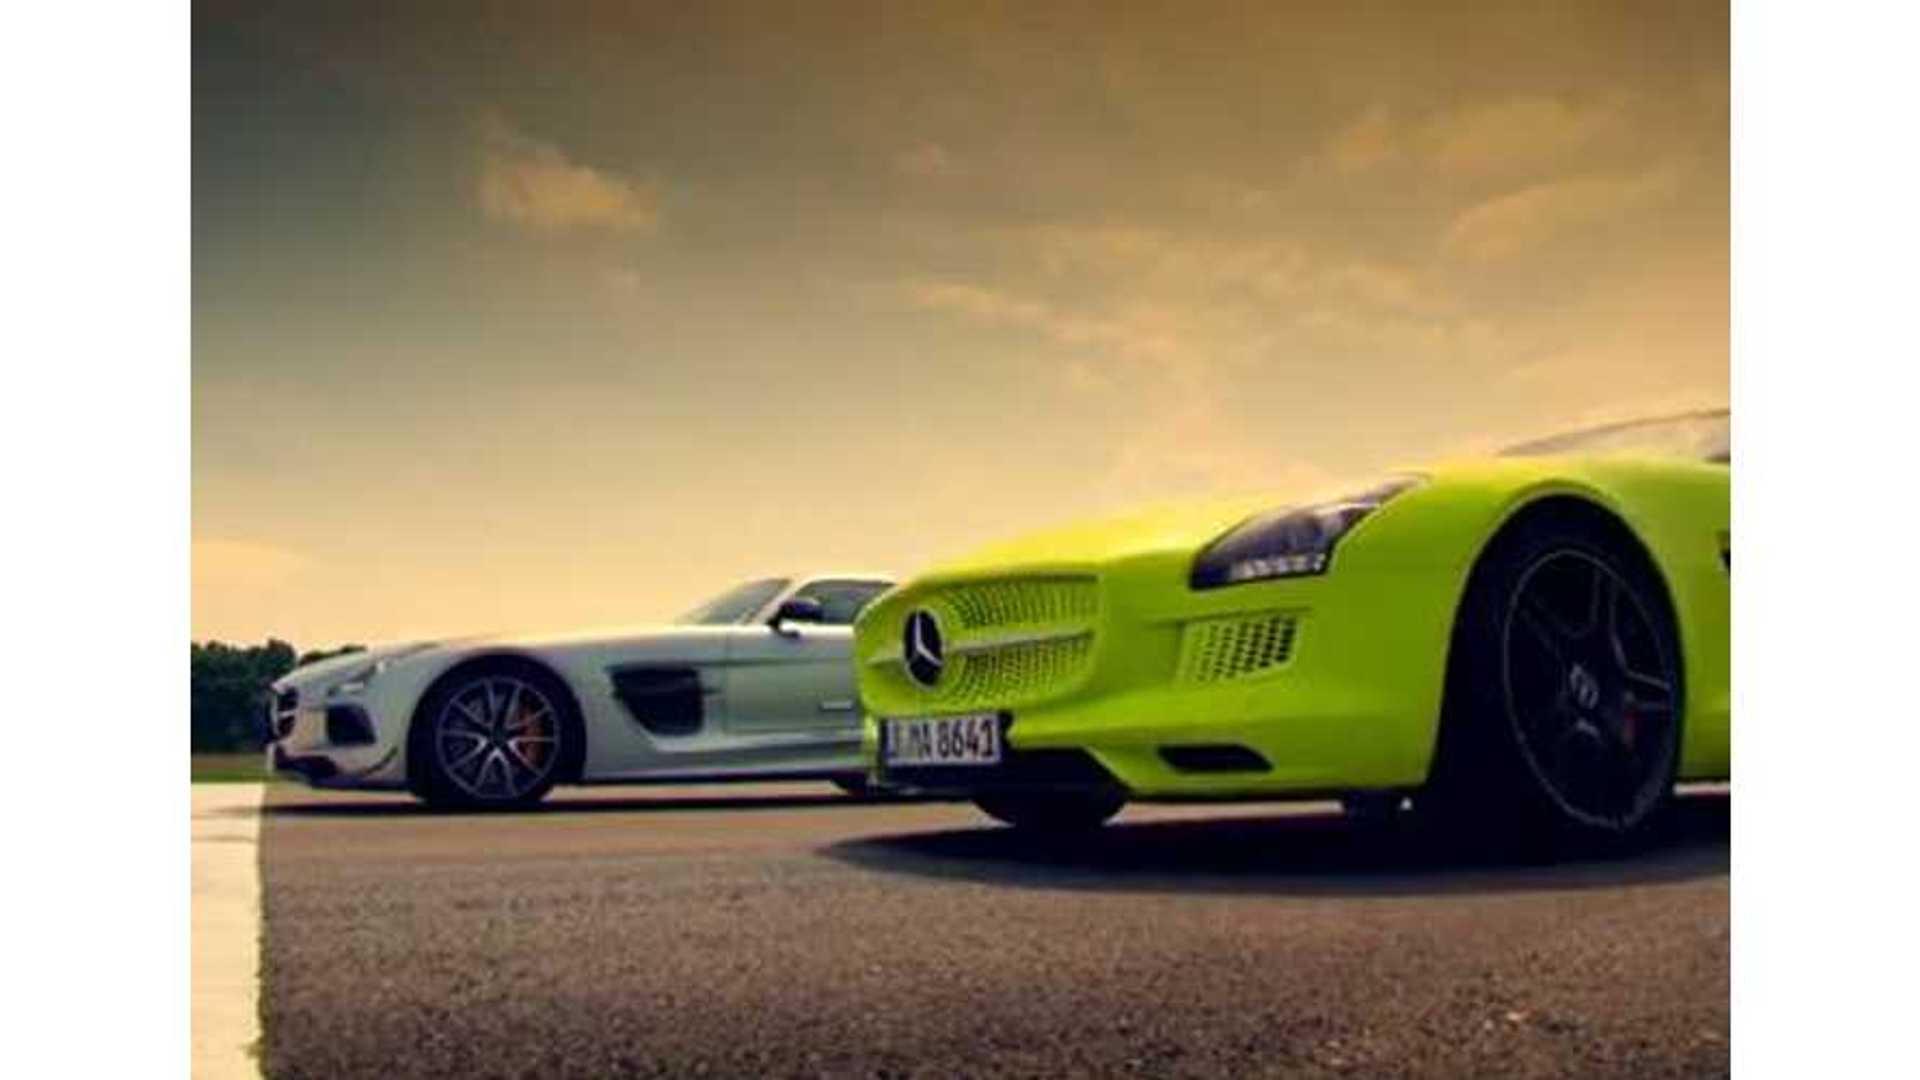 Mercedes Benz Sls Amg Electric Drive Versus Black Series Top Gear Video